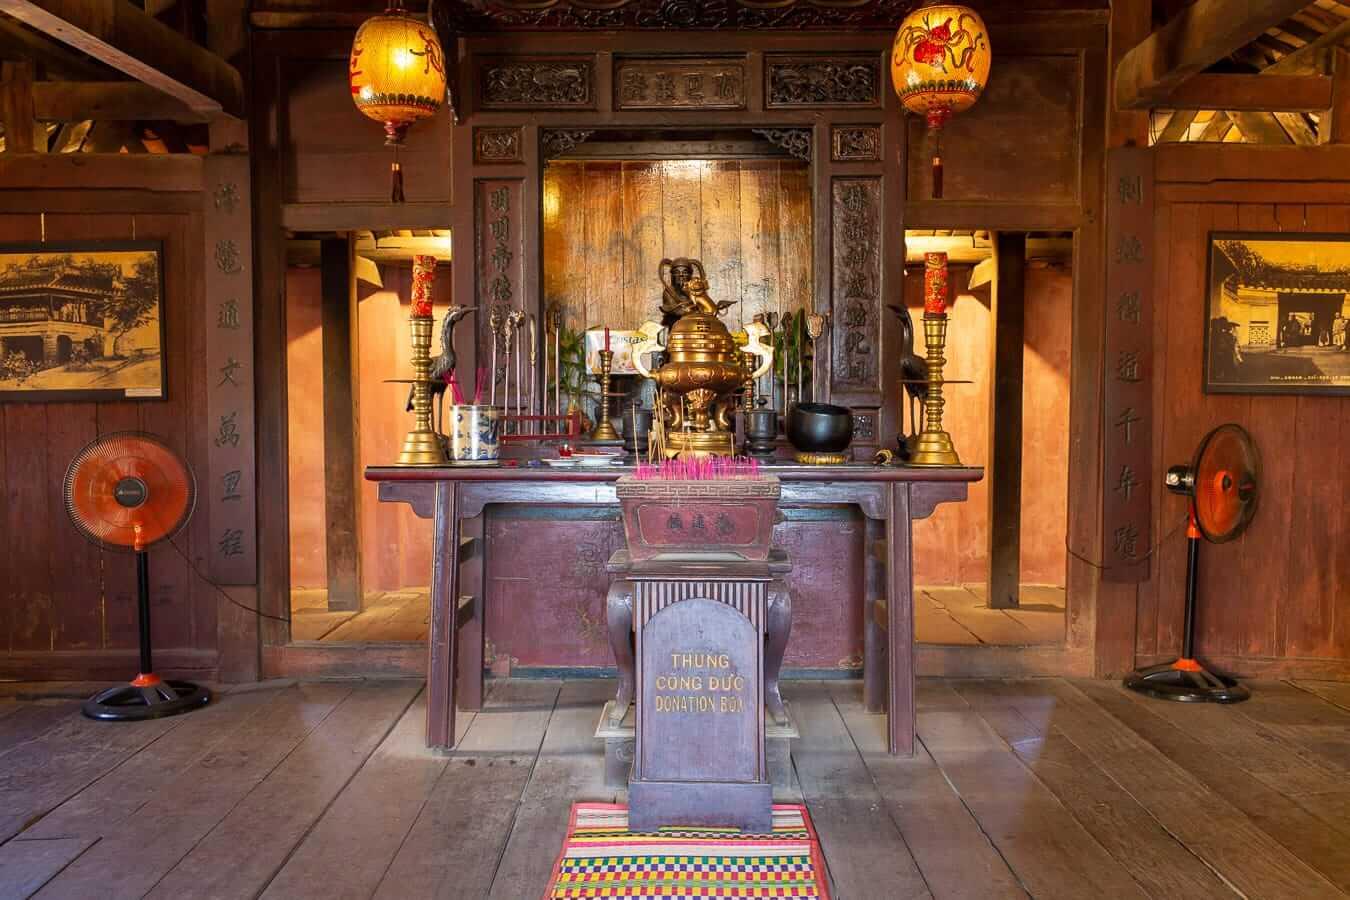 Japanese Bridge shrine: 3-day itinerary in Hoi An